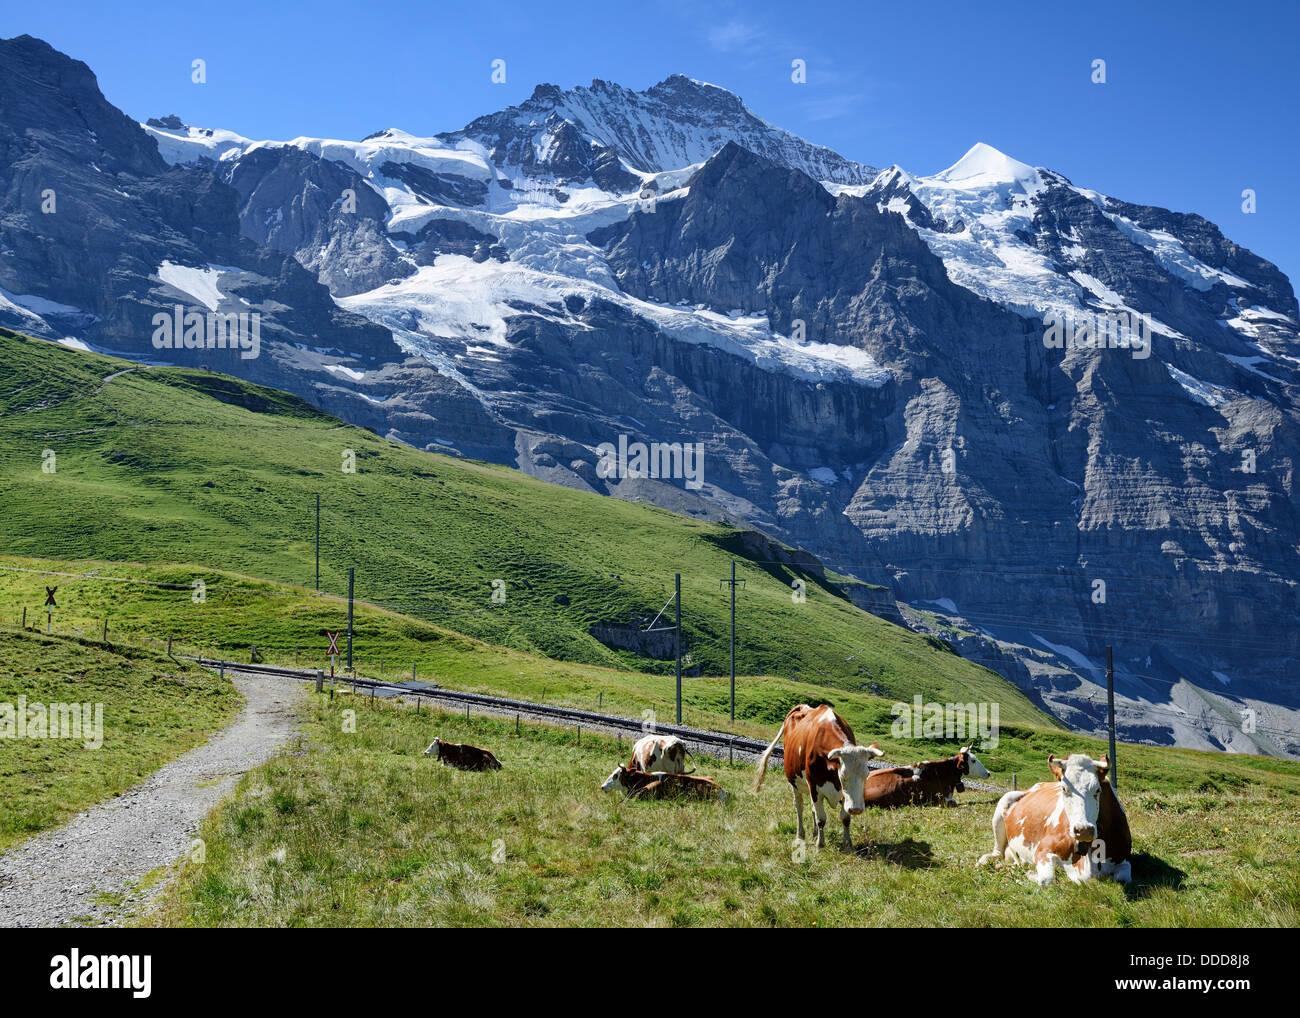 Kleine Scheidegg, mountain pass between Eiger and Lauberhorn peaks in the Bernese Oberland, Switzerland, Europe - Stock Image